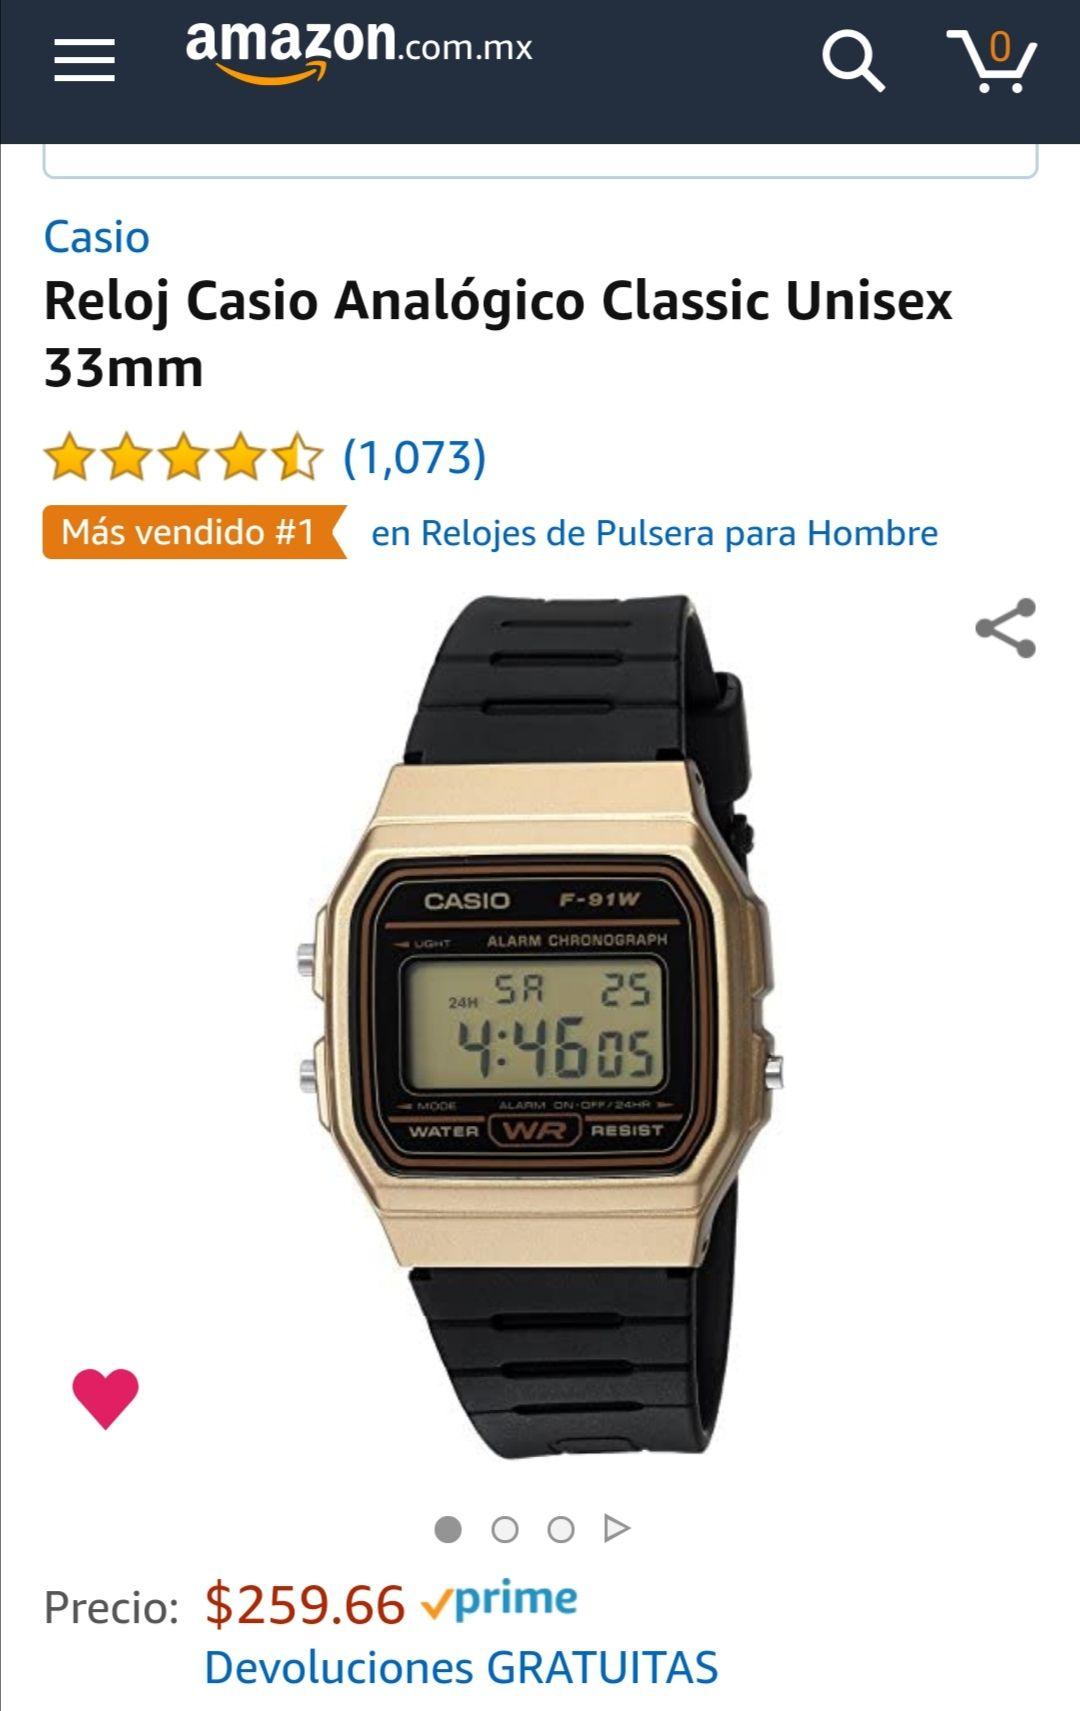 Amazon: Reloj Casio Analógico Classic Unisex 33mm (aplica prime)